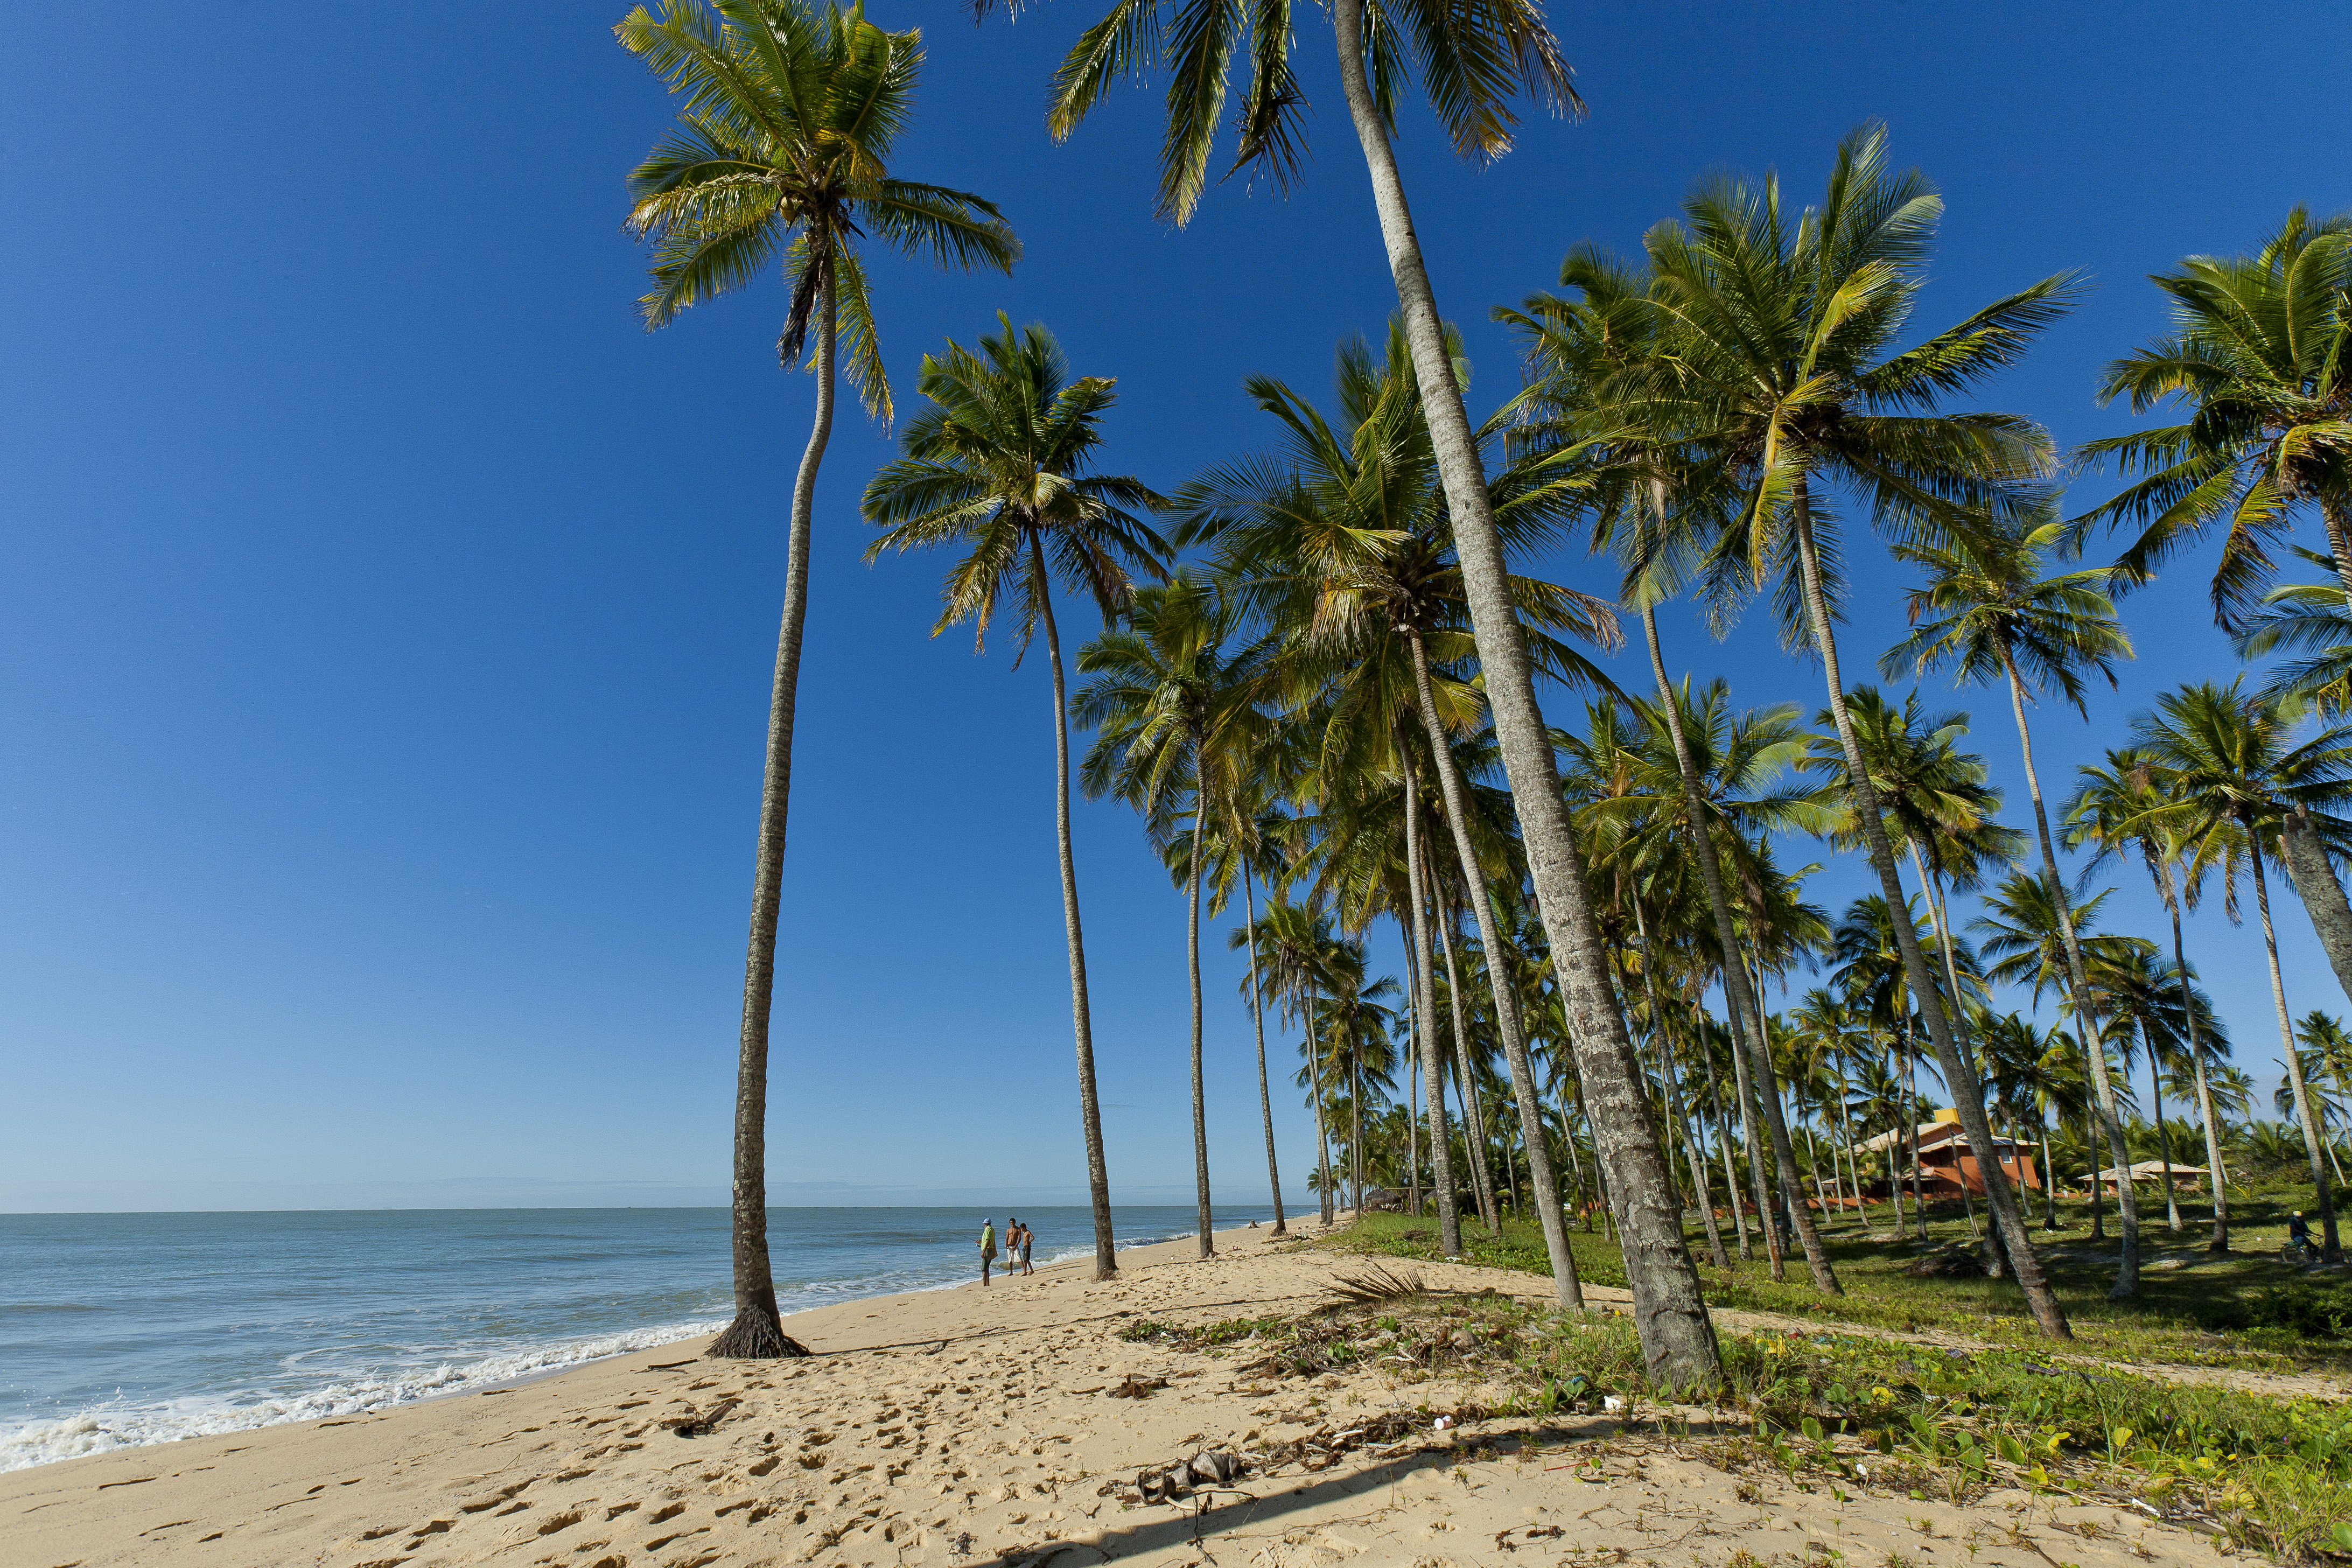 Prado Bahia fonte: upload.wikimedia.org